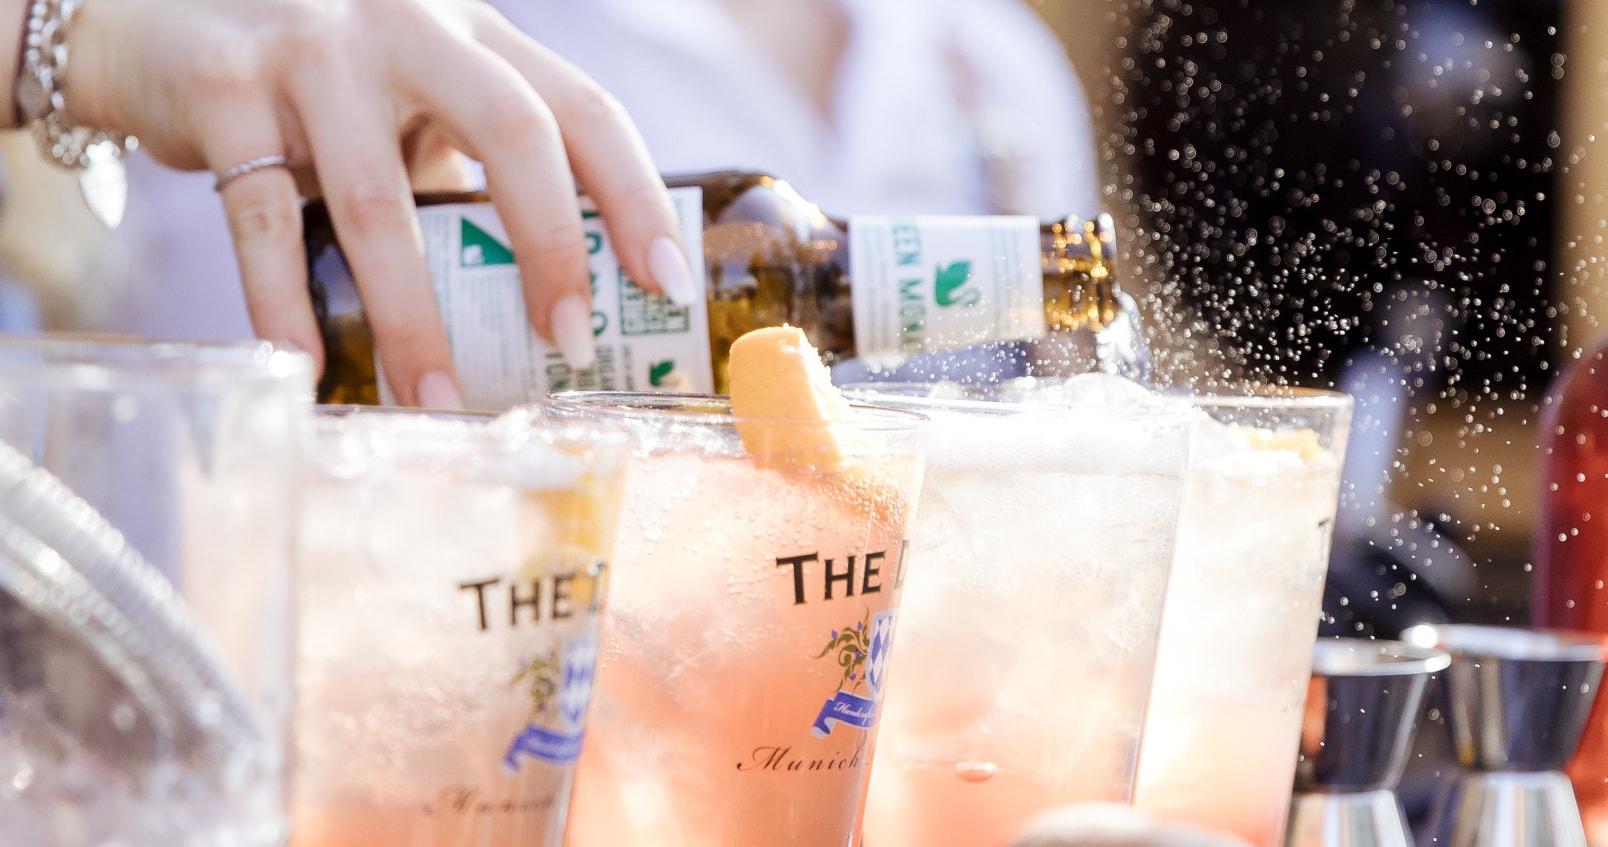 THE DUKE Tales: Was ist die perfekte Gin Tonic Kombination?